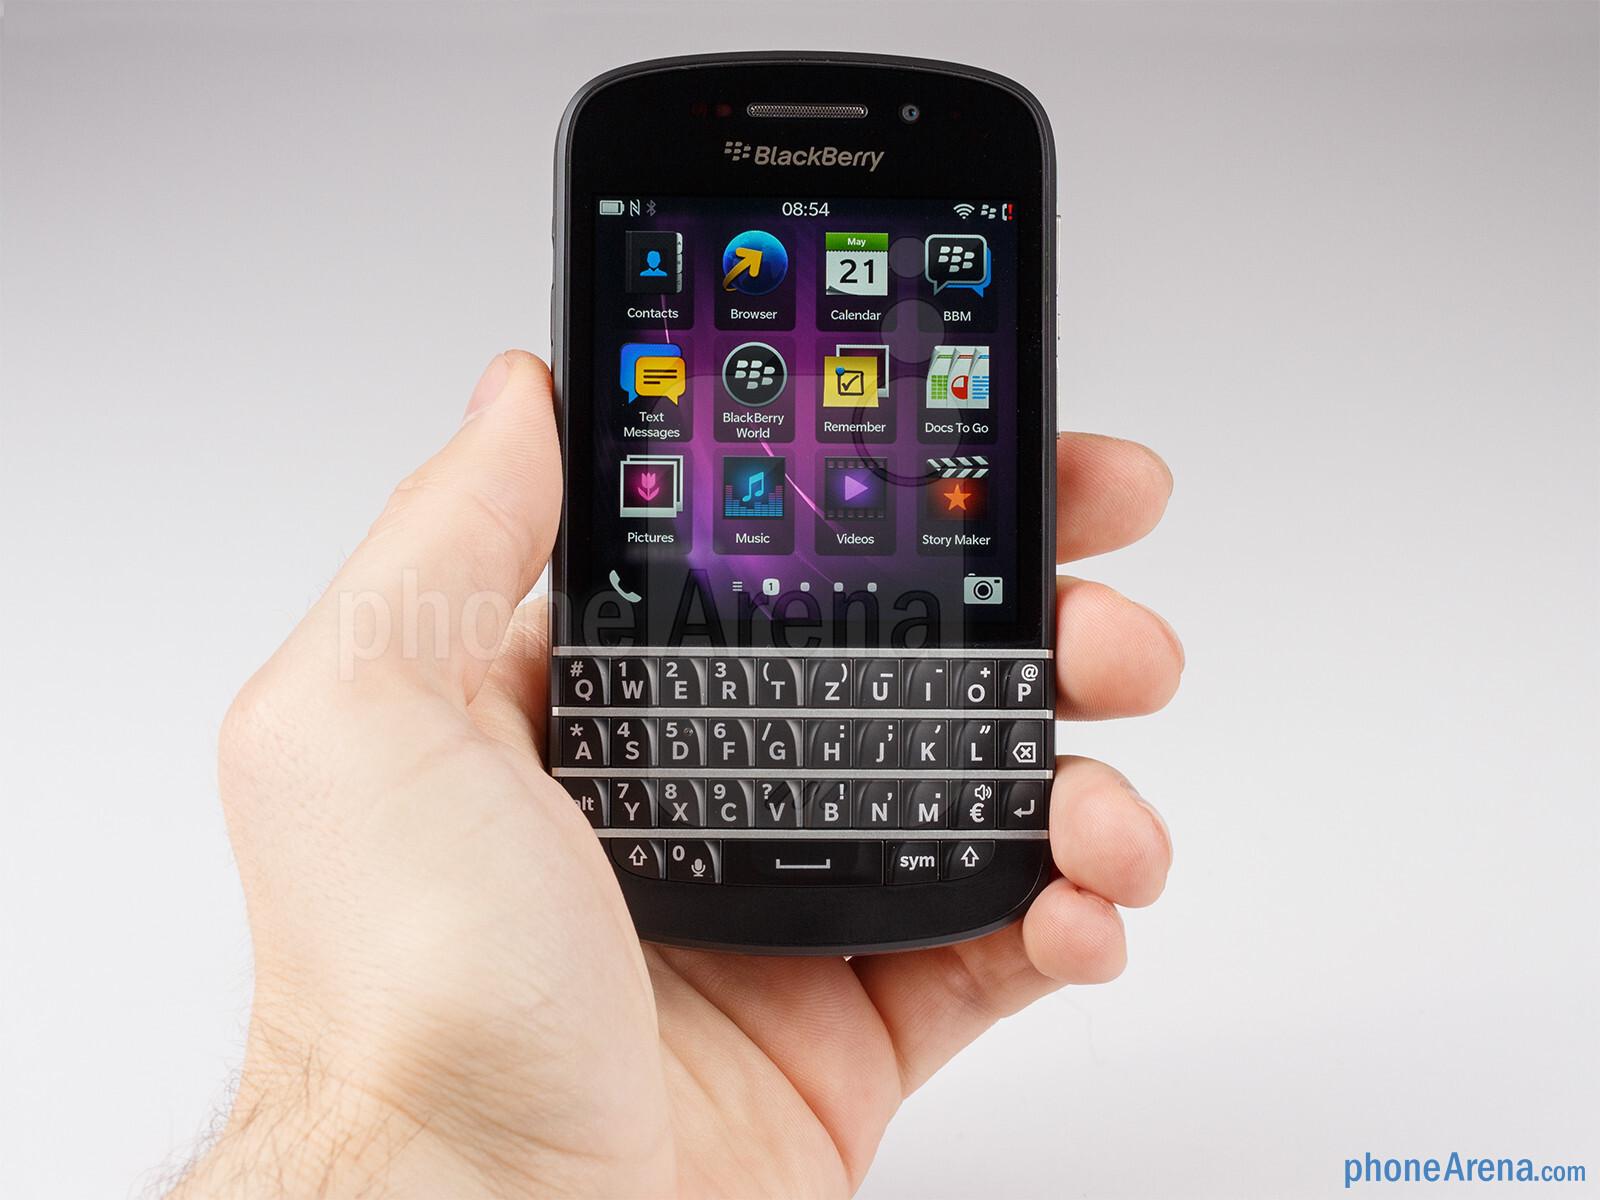 blackberry q10 review phonearena